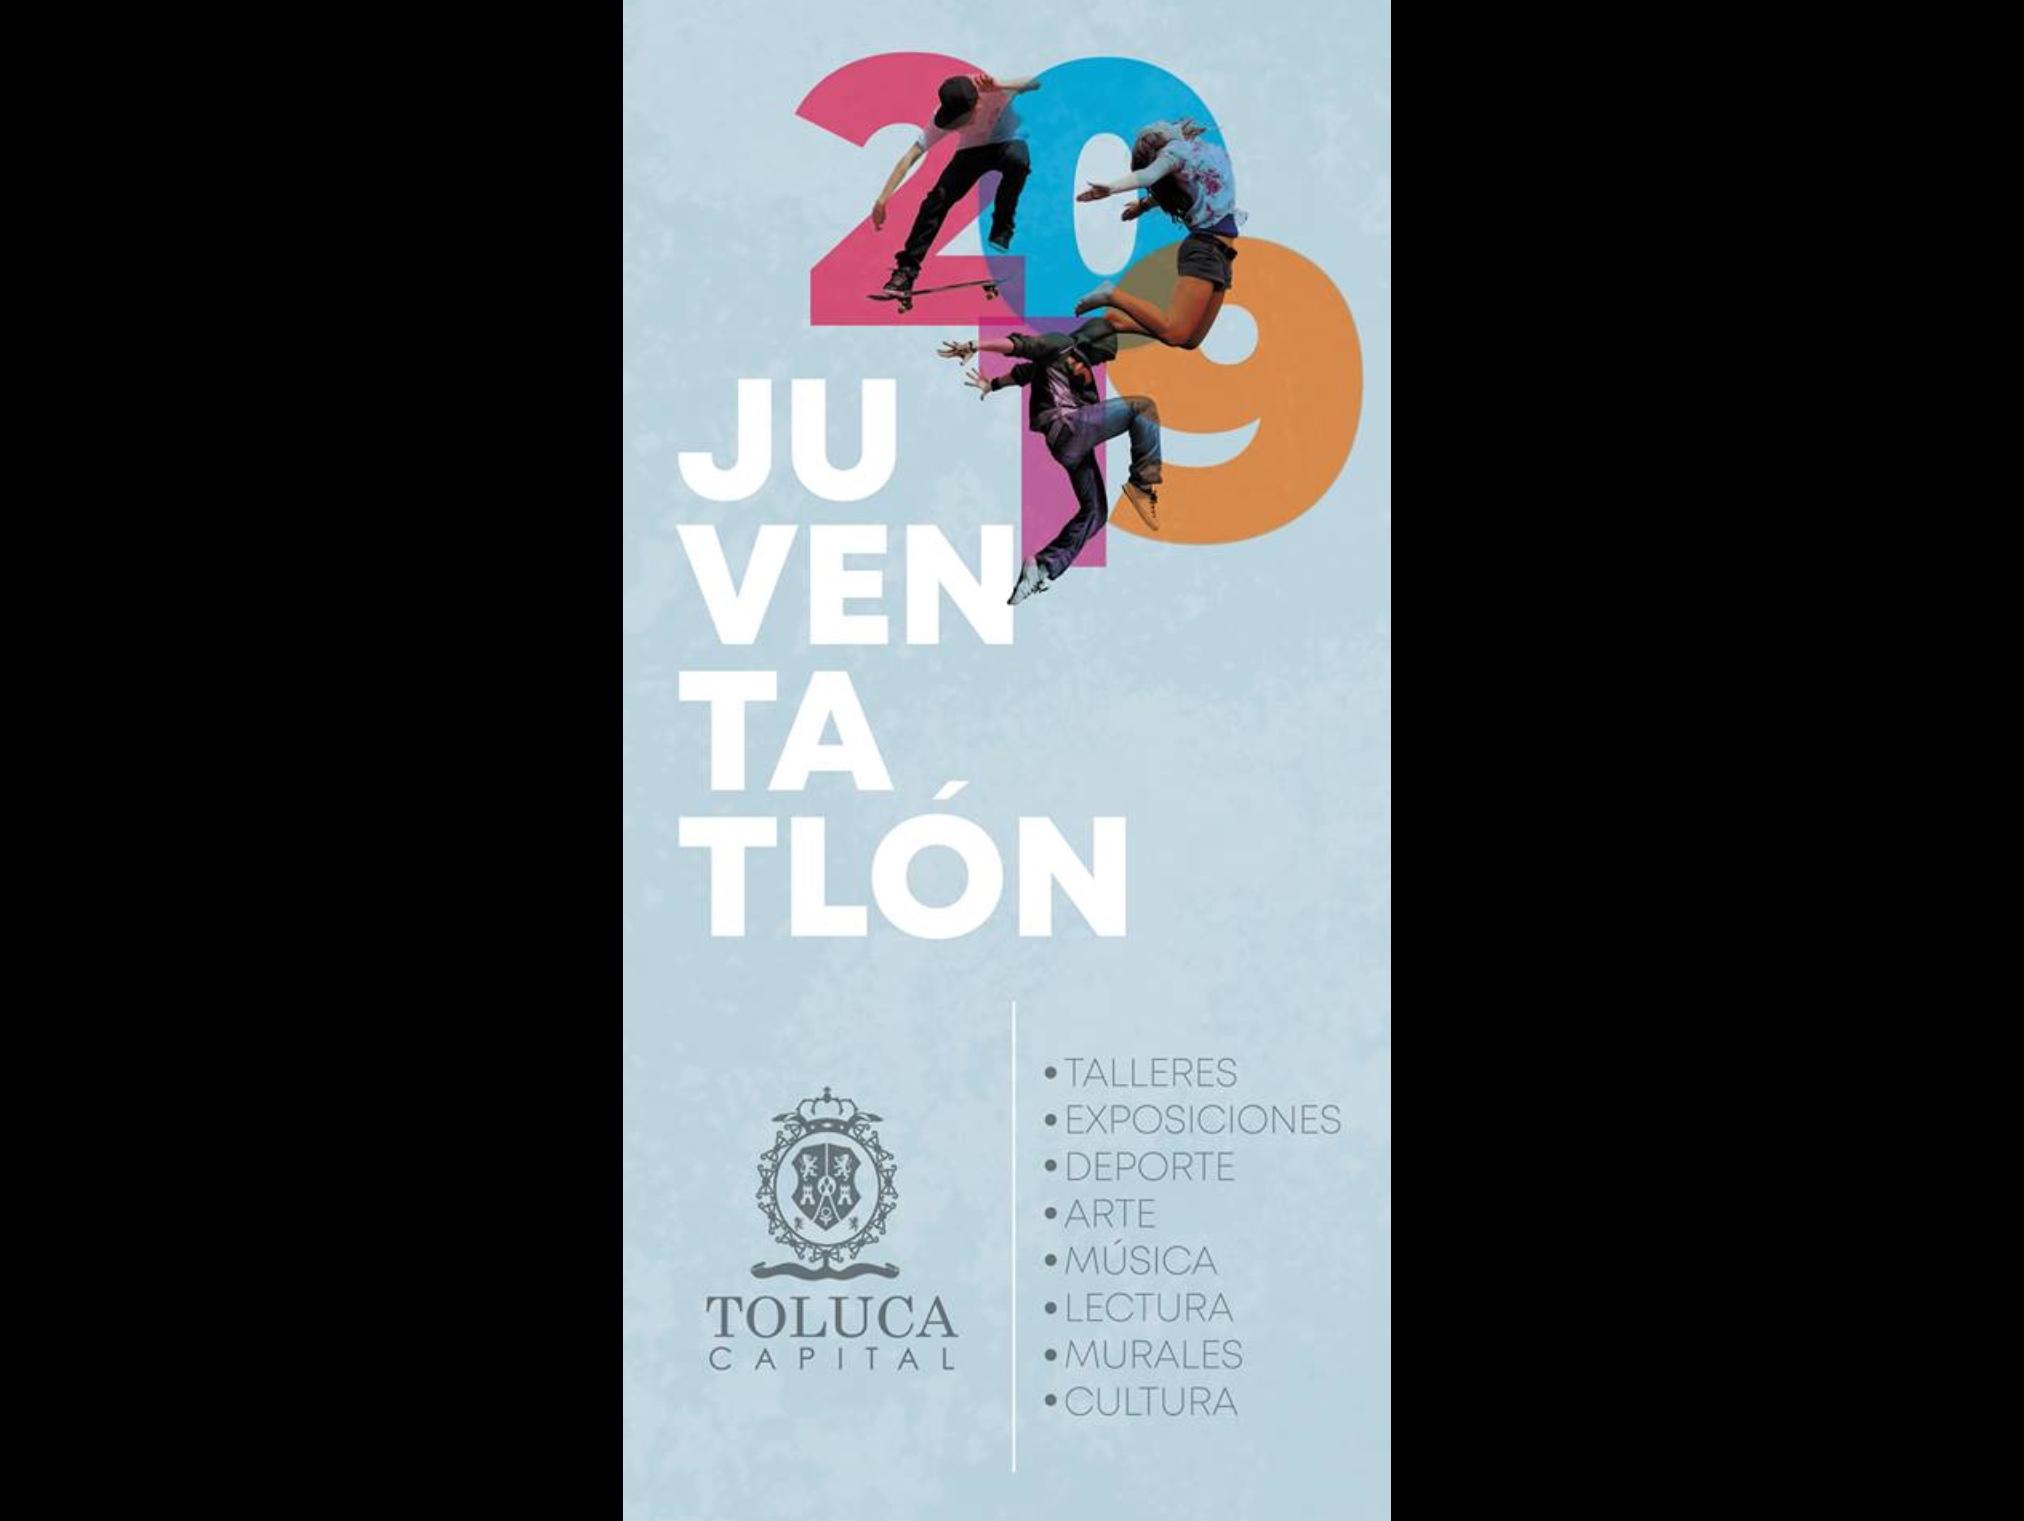 Arma Toluca festival para jóvenes